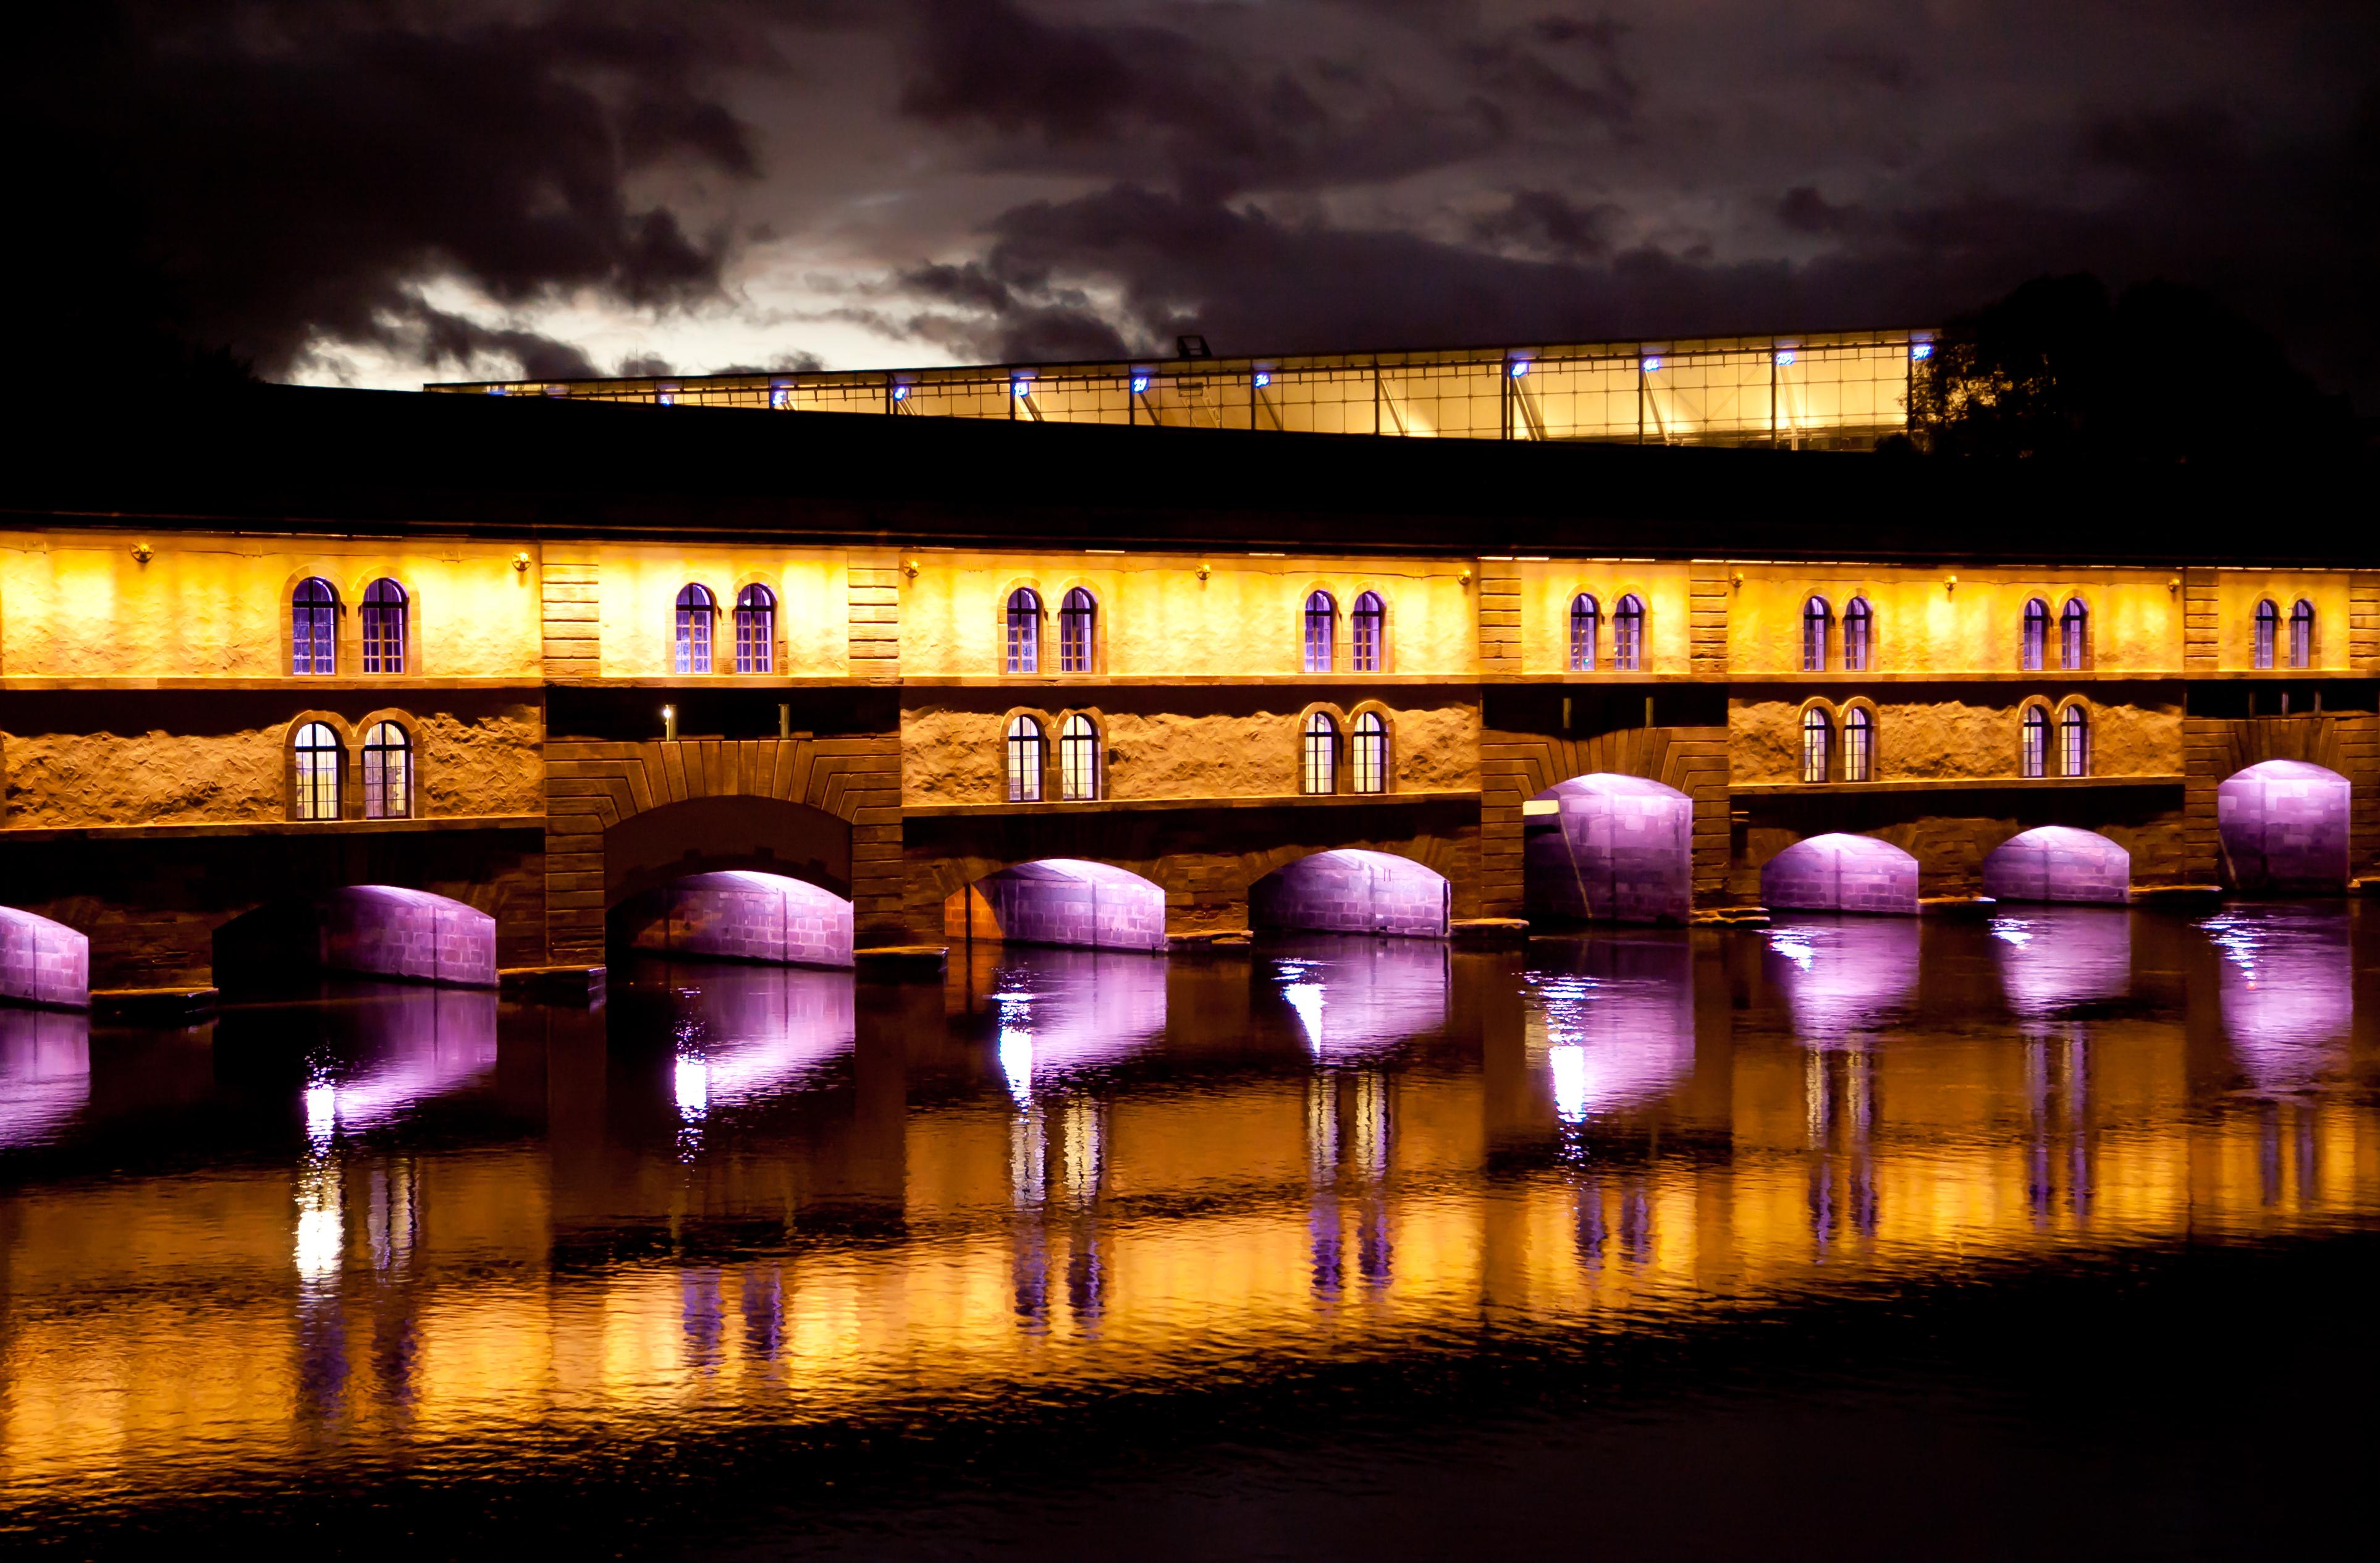 Vauban Dam, Strasbourg, France